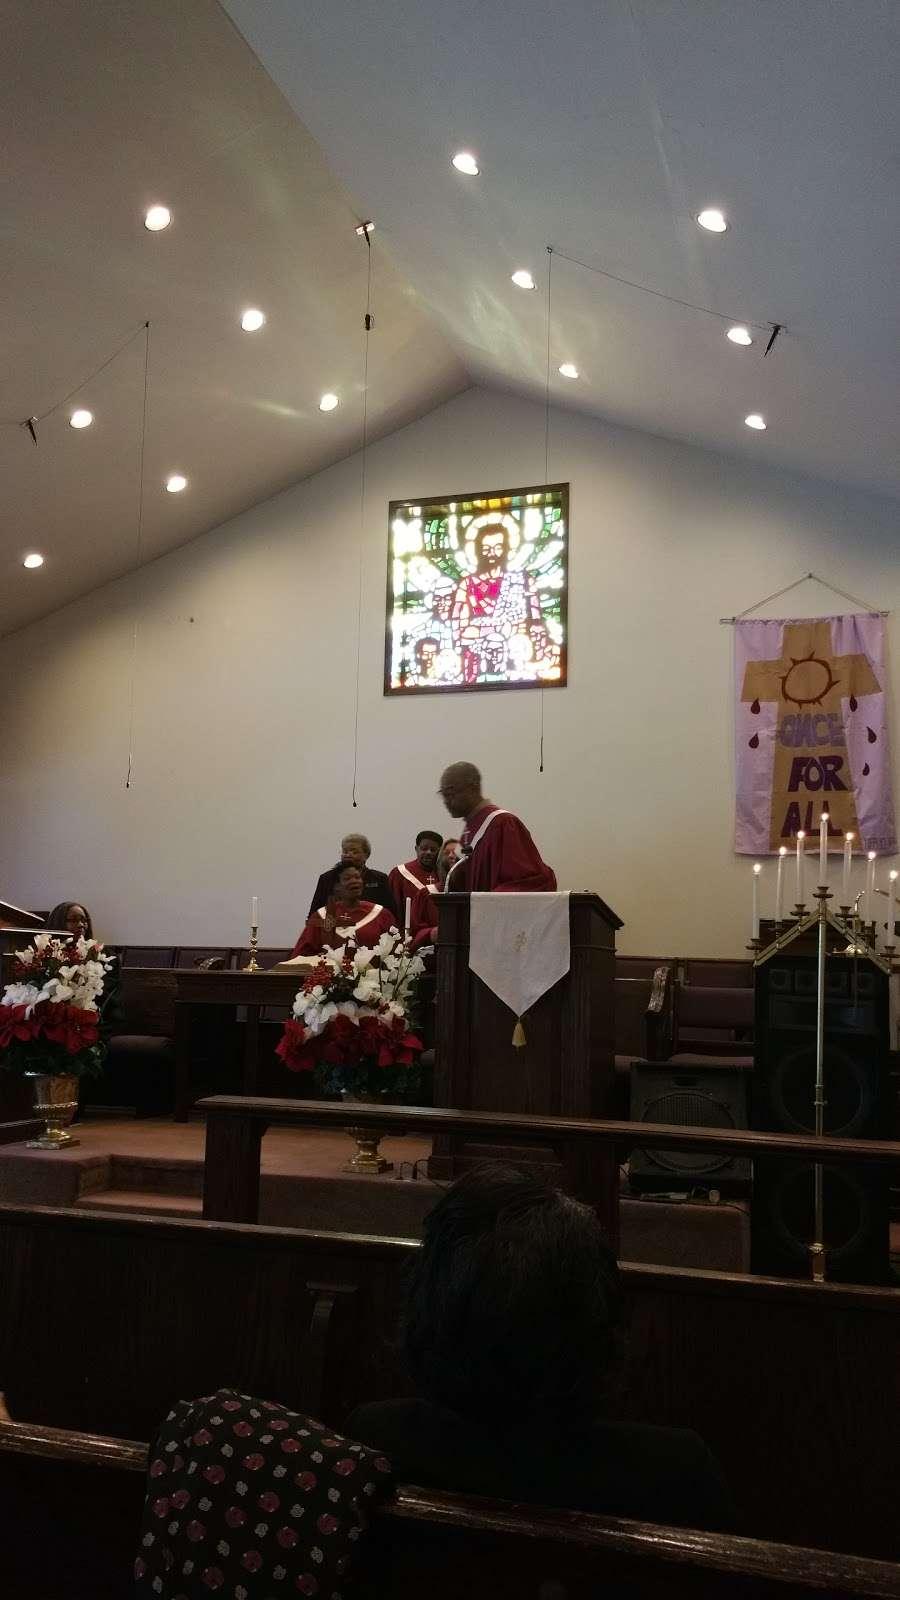 St Paul Ame Church - church  | Photo 2 of 4 | Address: 336 Washington Ave, Glencoe, IL 60022, USA | Phone: (847) 835-4421